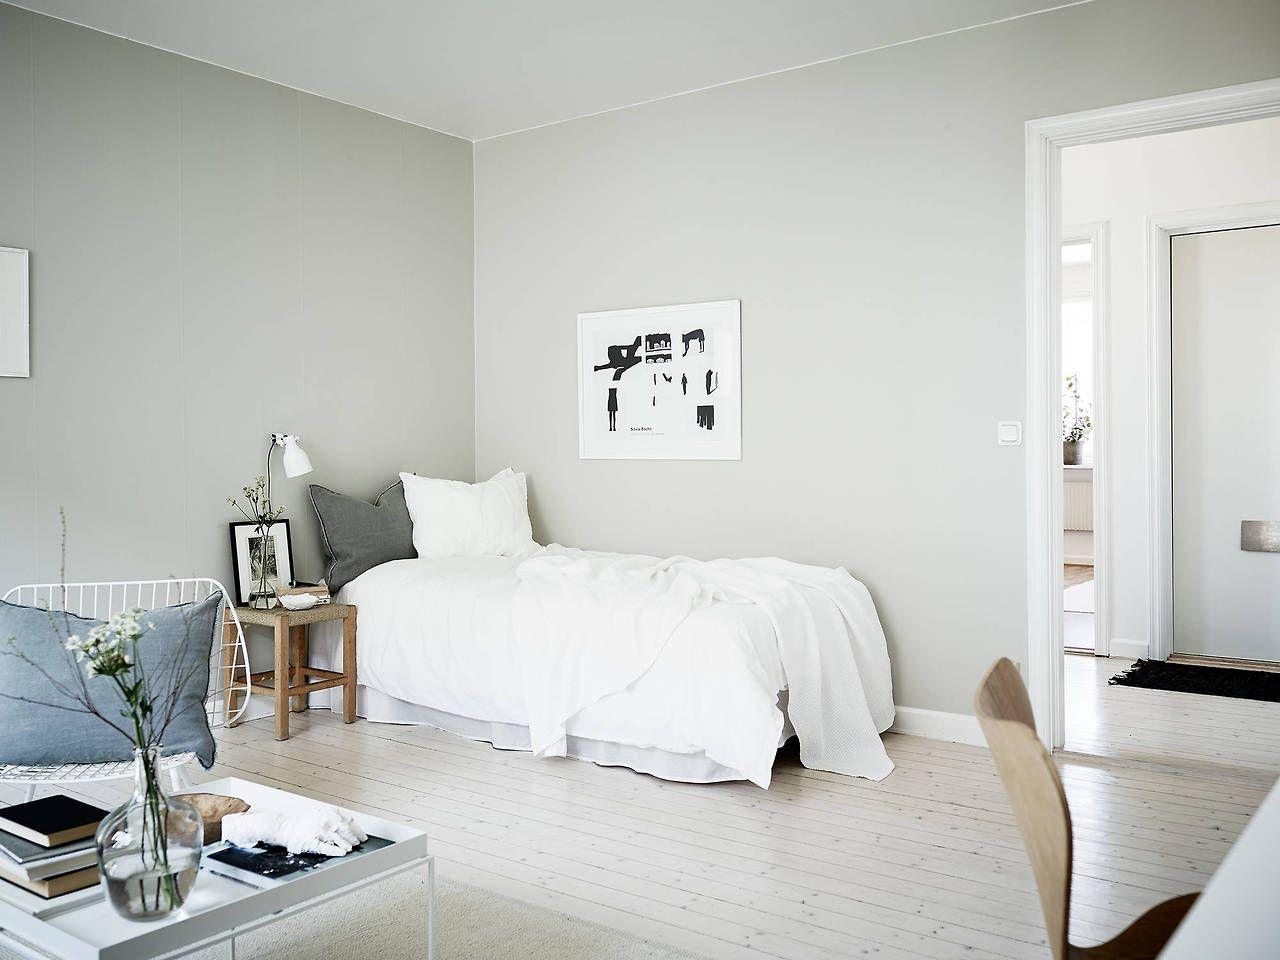 gravityhome Studio Loft ApartmentsStudio AptTiny Serene